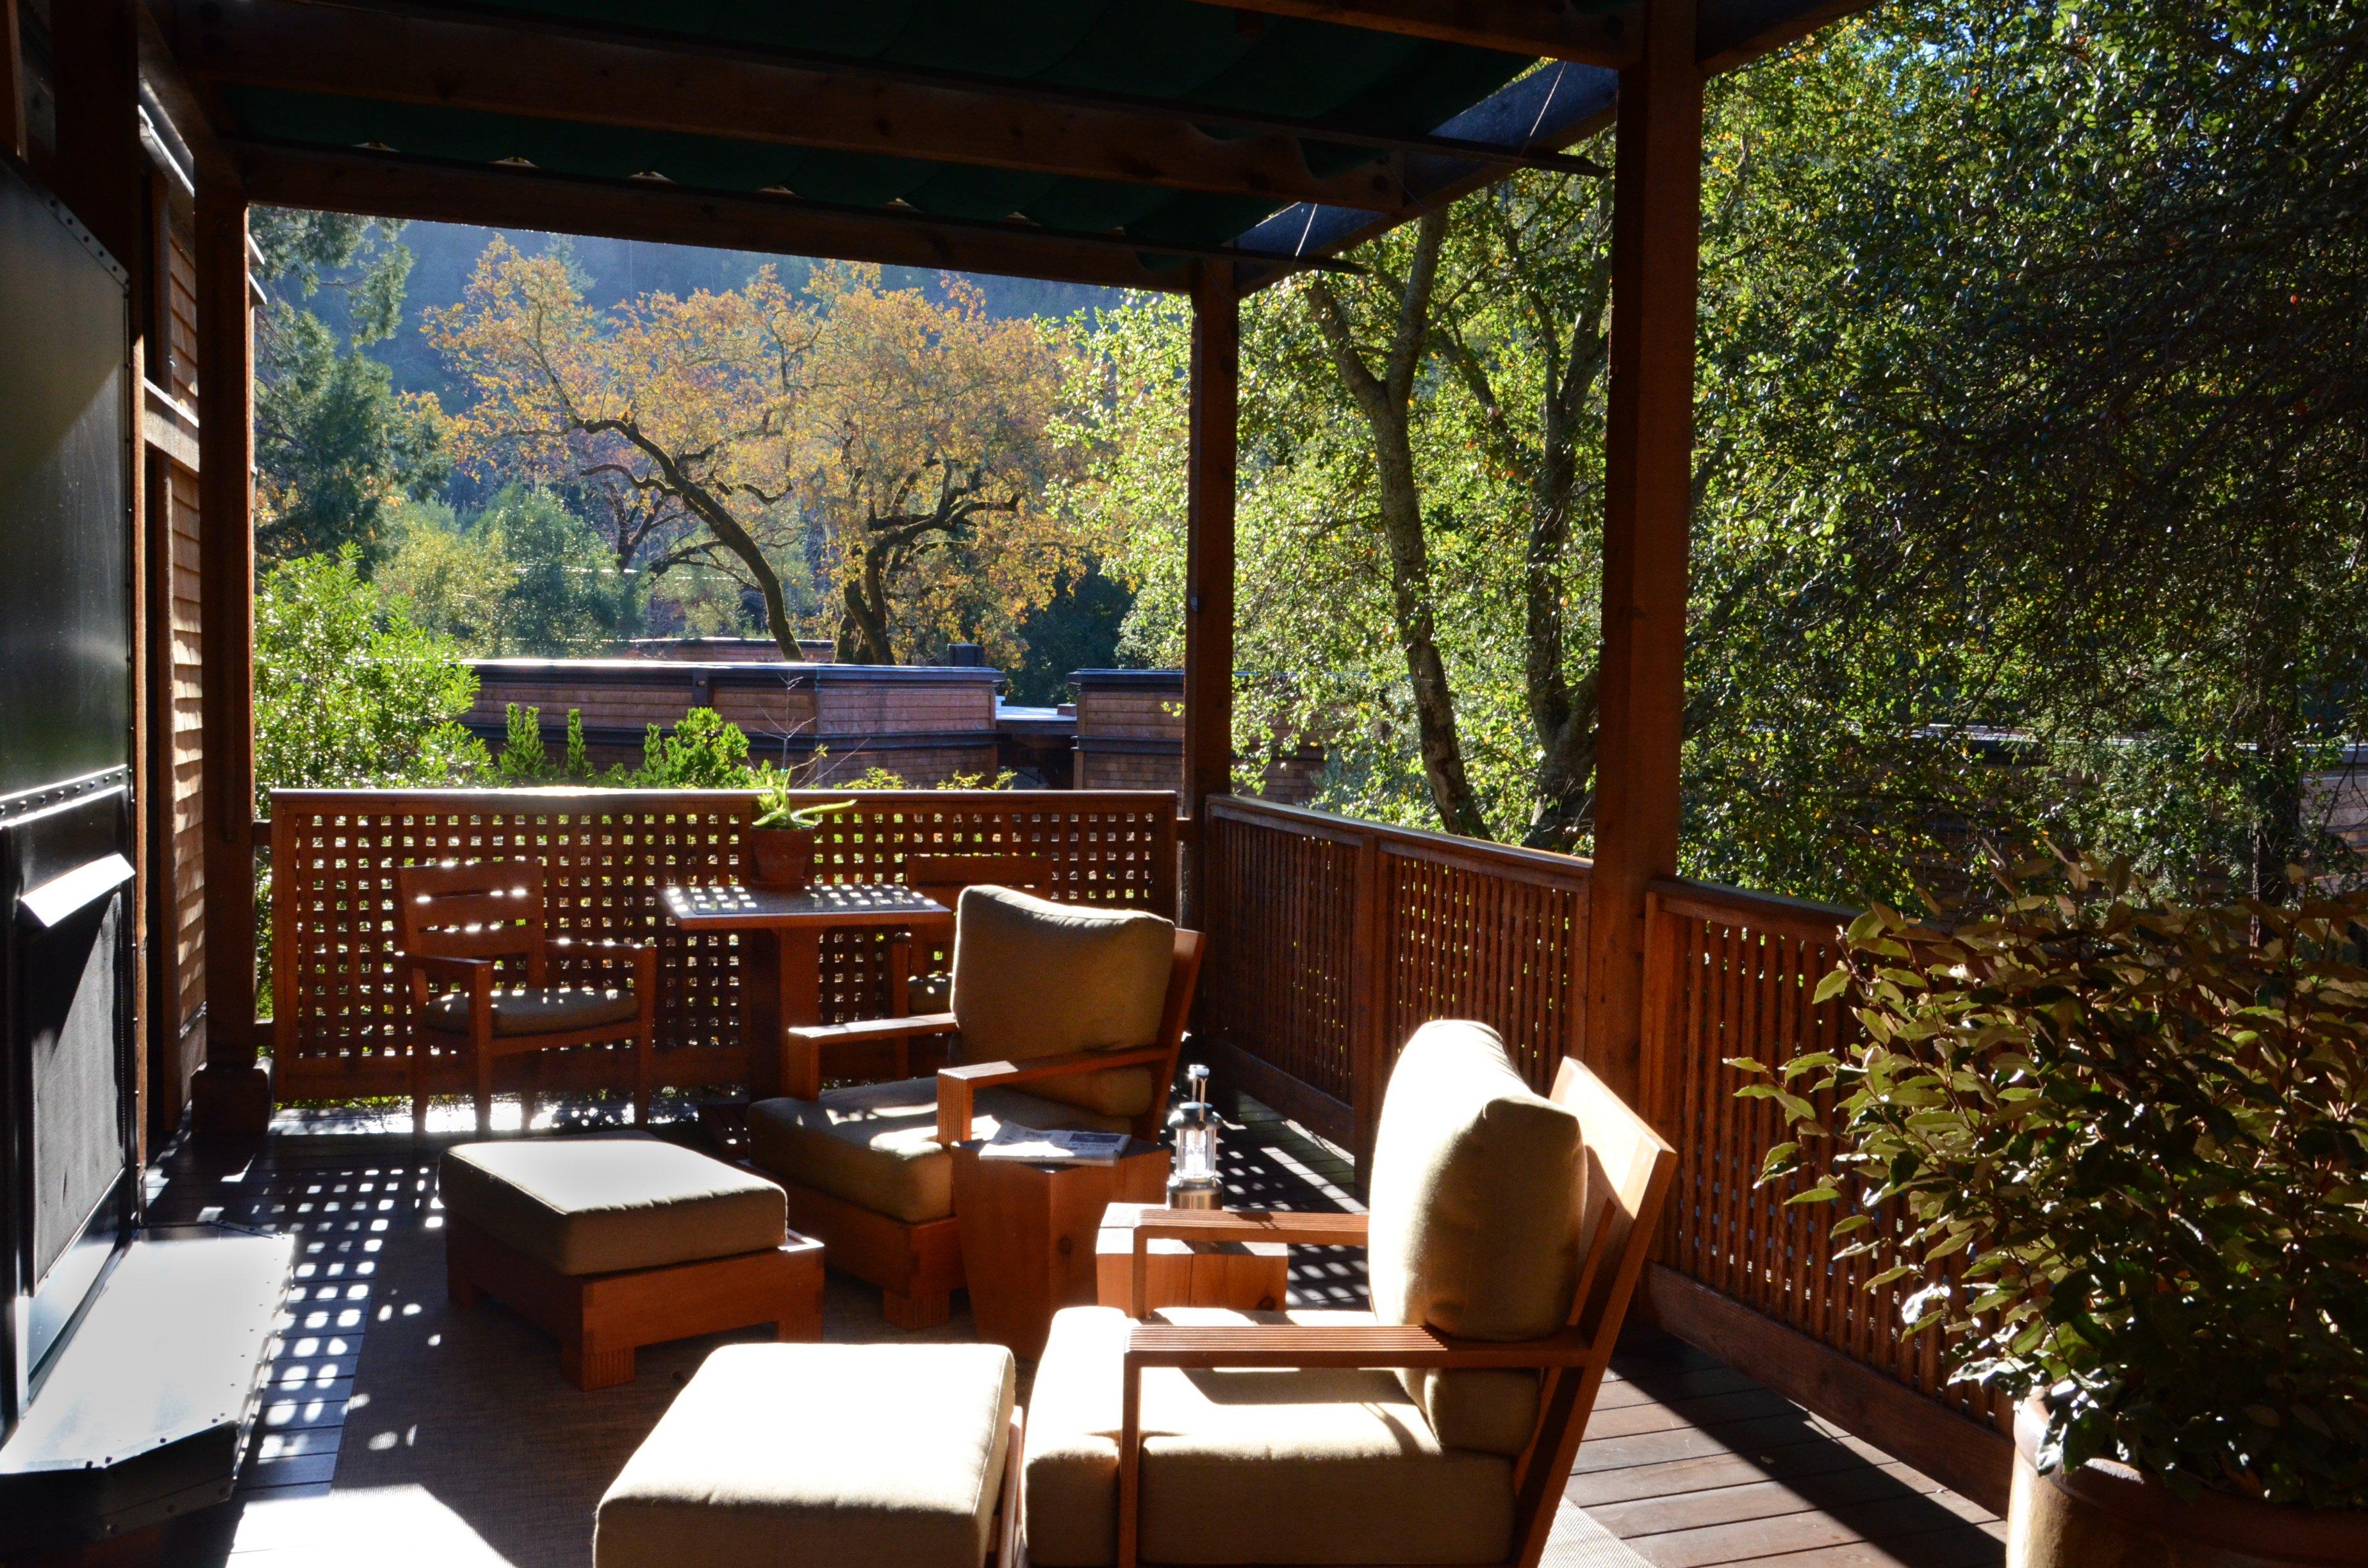 Calistoga Ranch Calistoga No Ordinary Resort : calistoga ranch 11 13 055 from noordinaryresort.com size 3696 x 2448 jpeg 1711kB